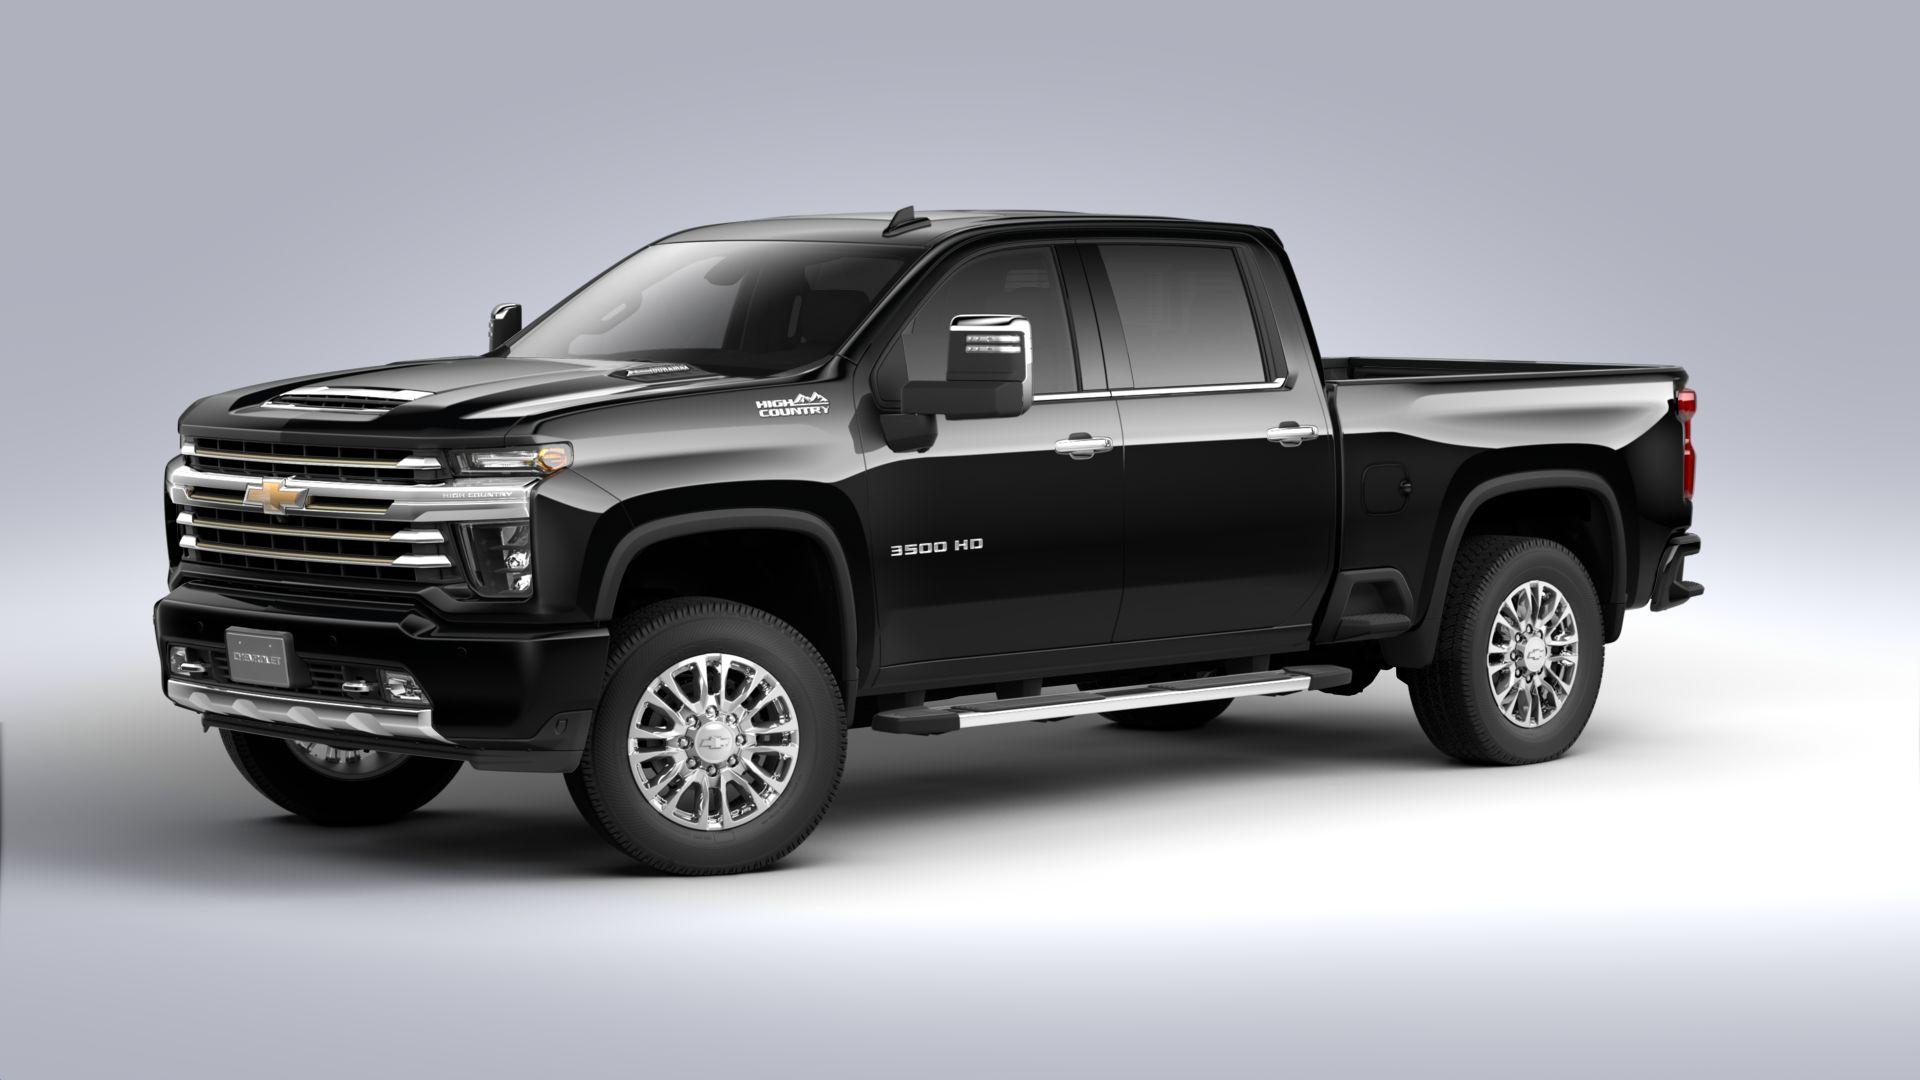 2020 Chevrolet Silverado 3500 HD High Country